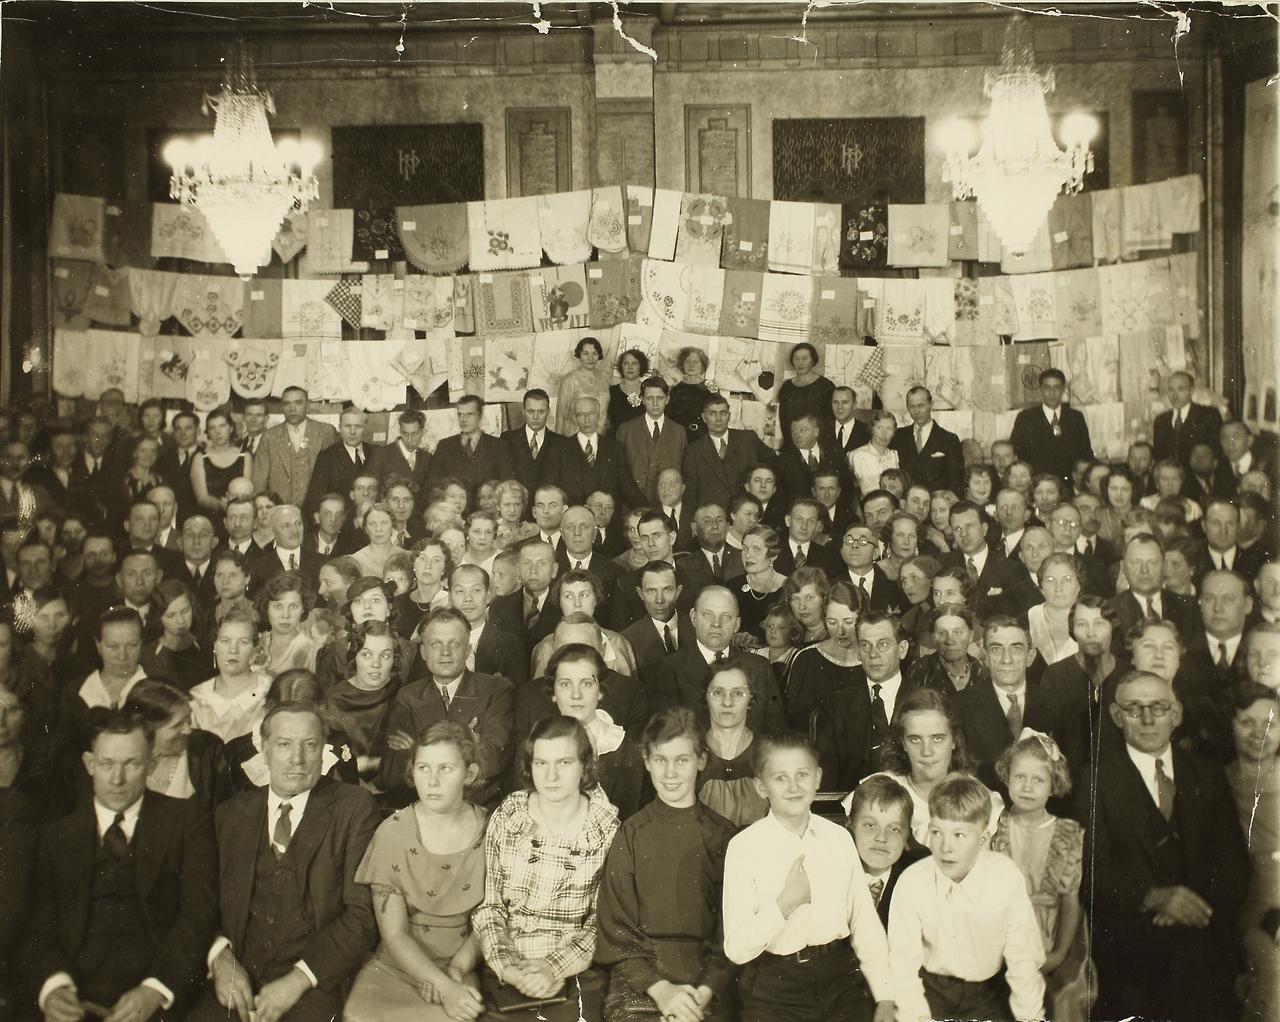 ERAF.9595.1.19.8. Grupifoto New Yorgi Eesti Töölisklubi basaarilt 1936. aastal.